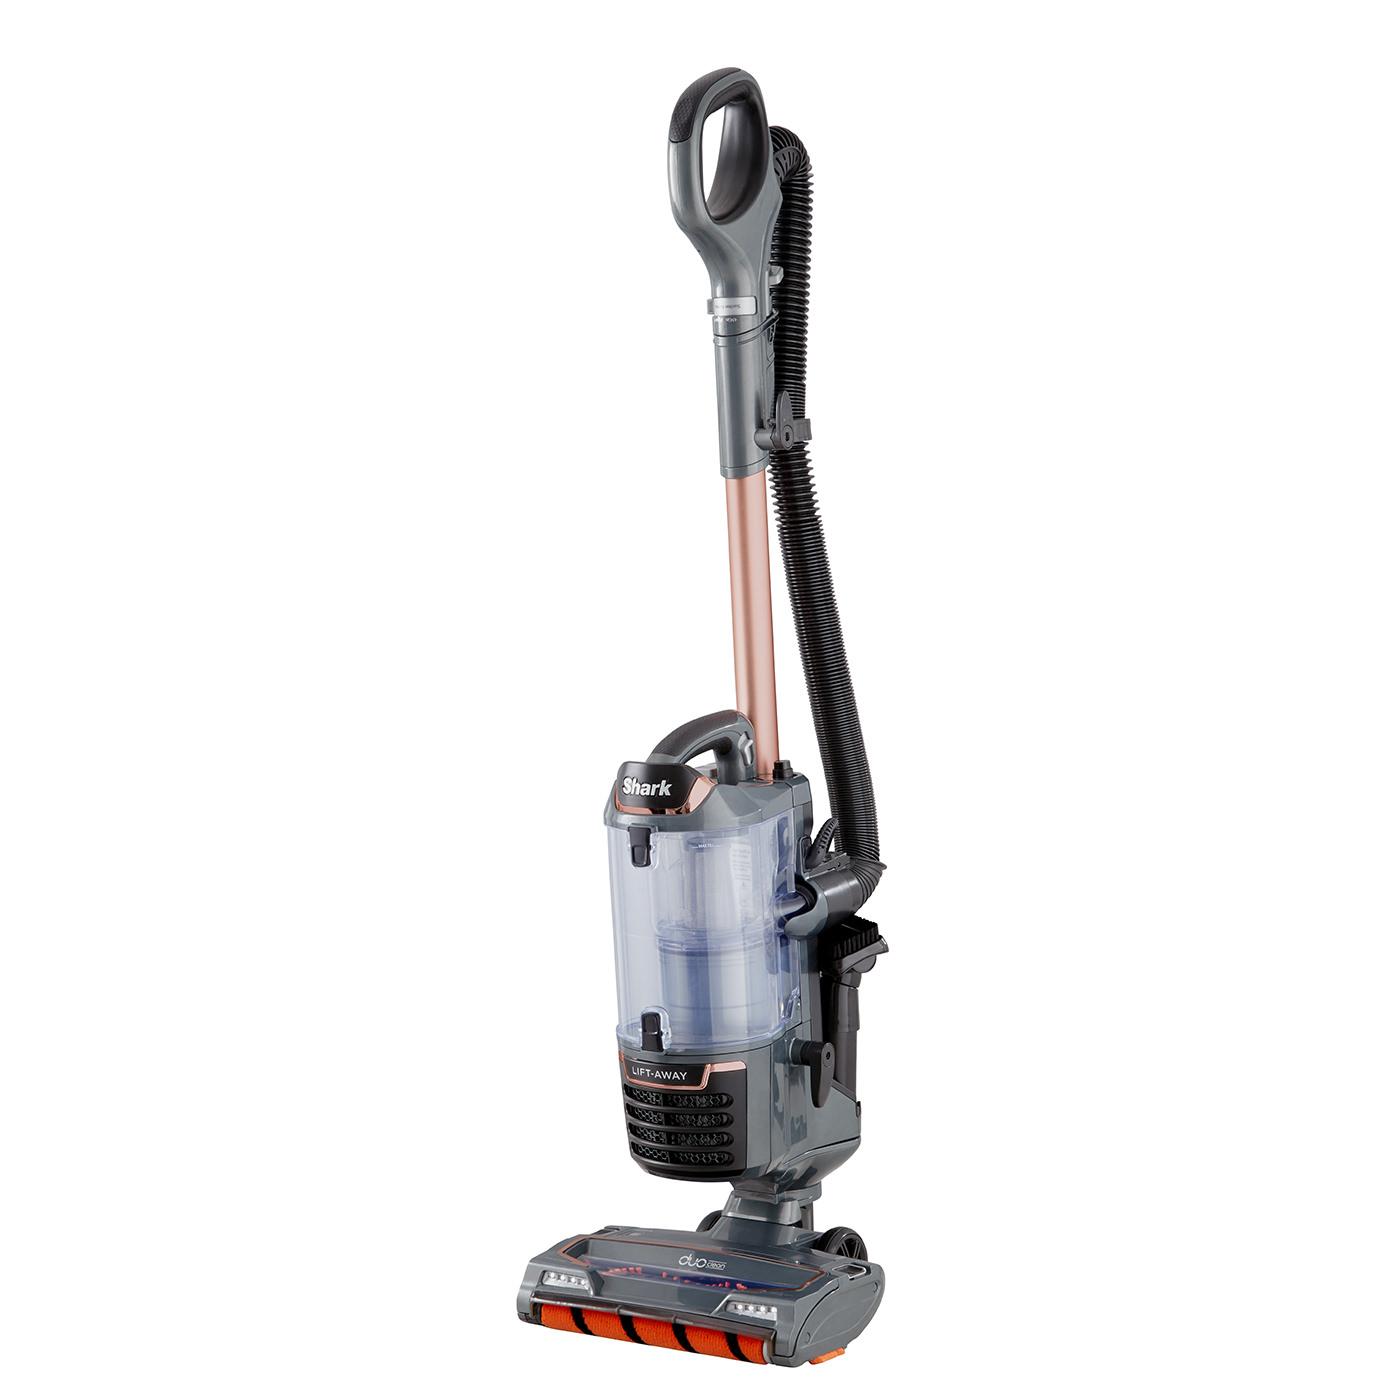 Shark Duoclean Lift Away Upright Vacuum Cleaner Nv701uktq